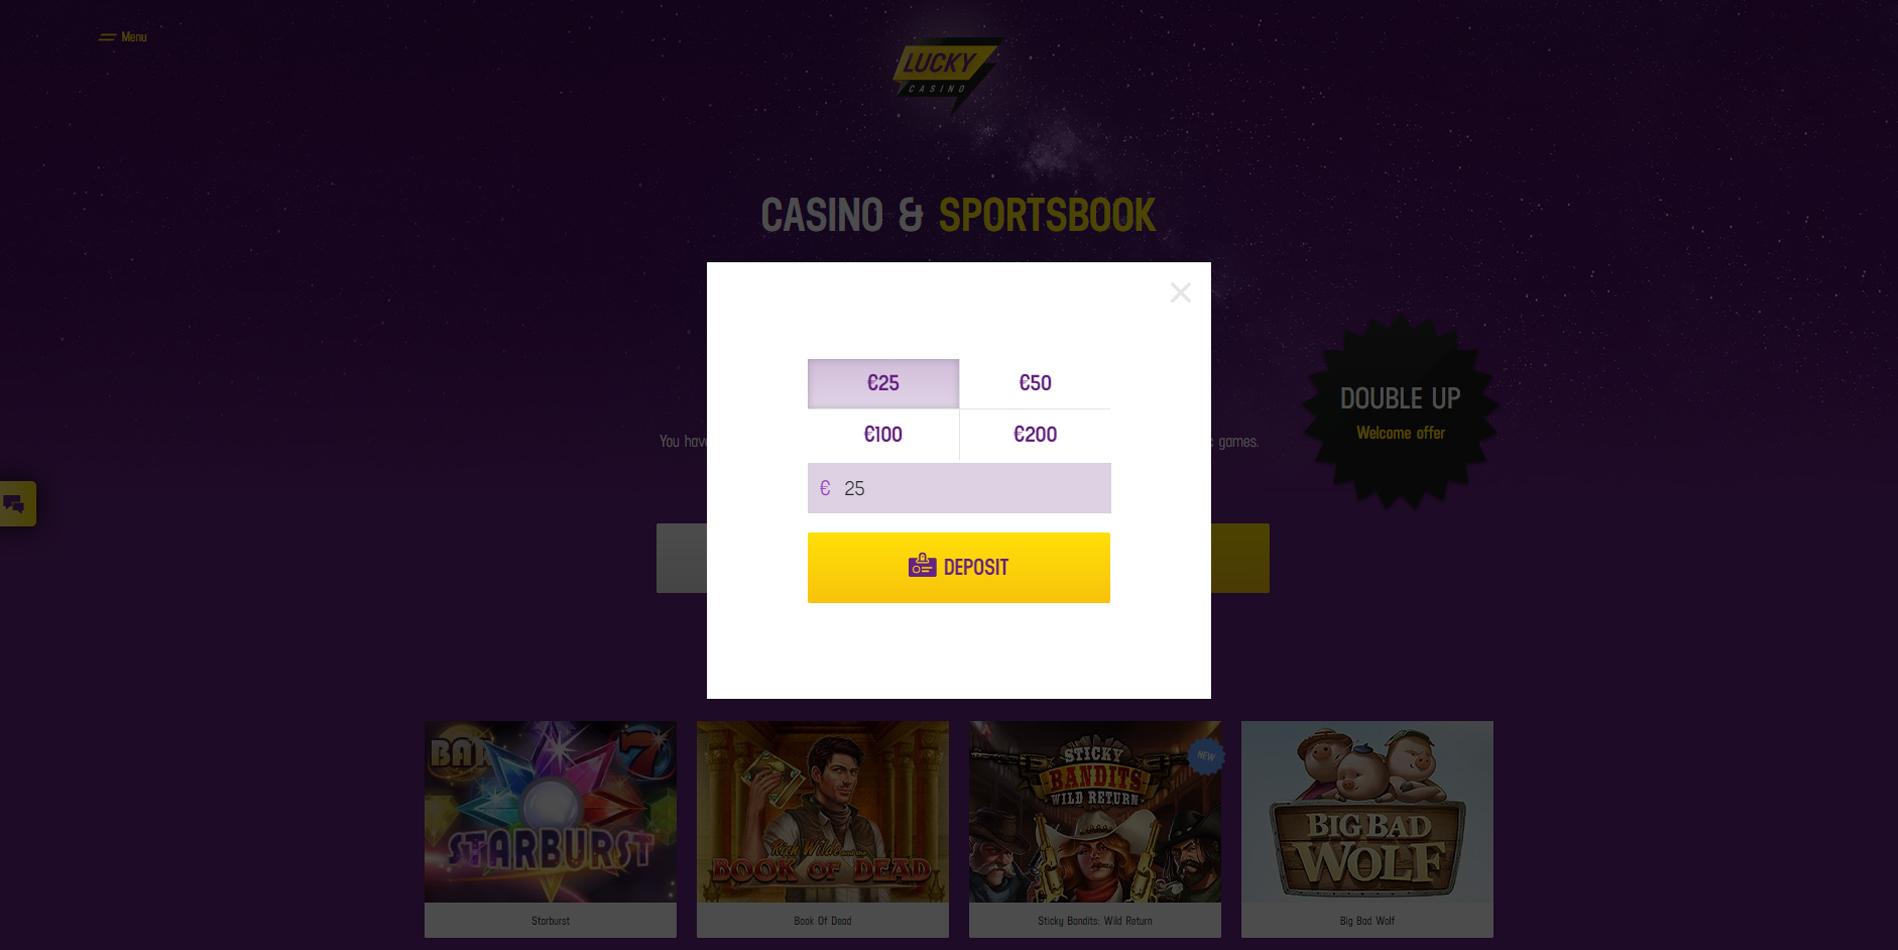 lucky casino deposit